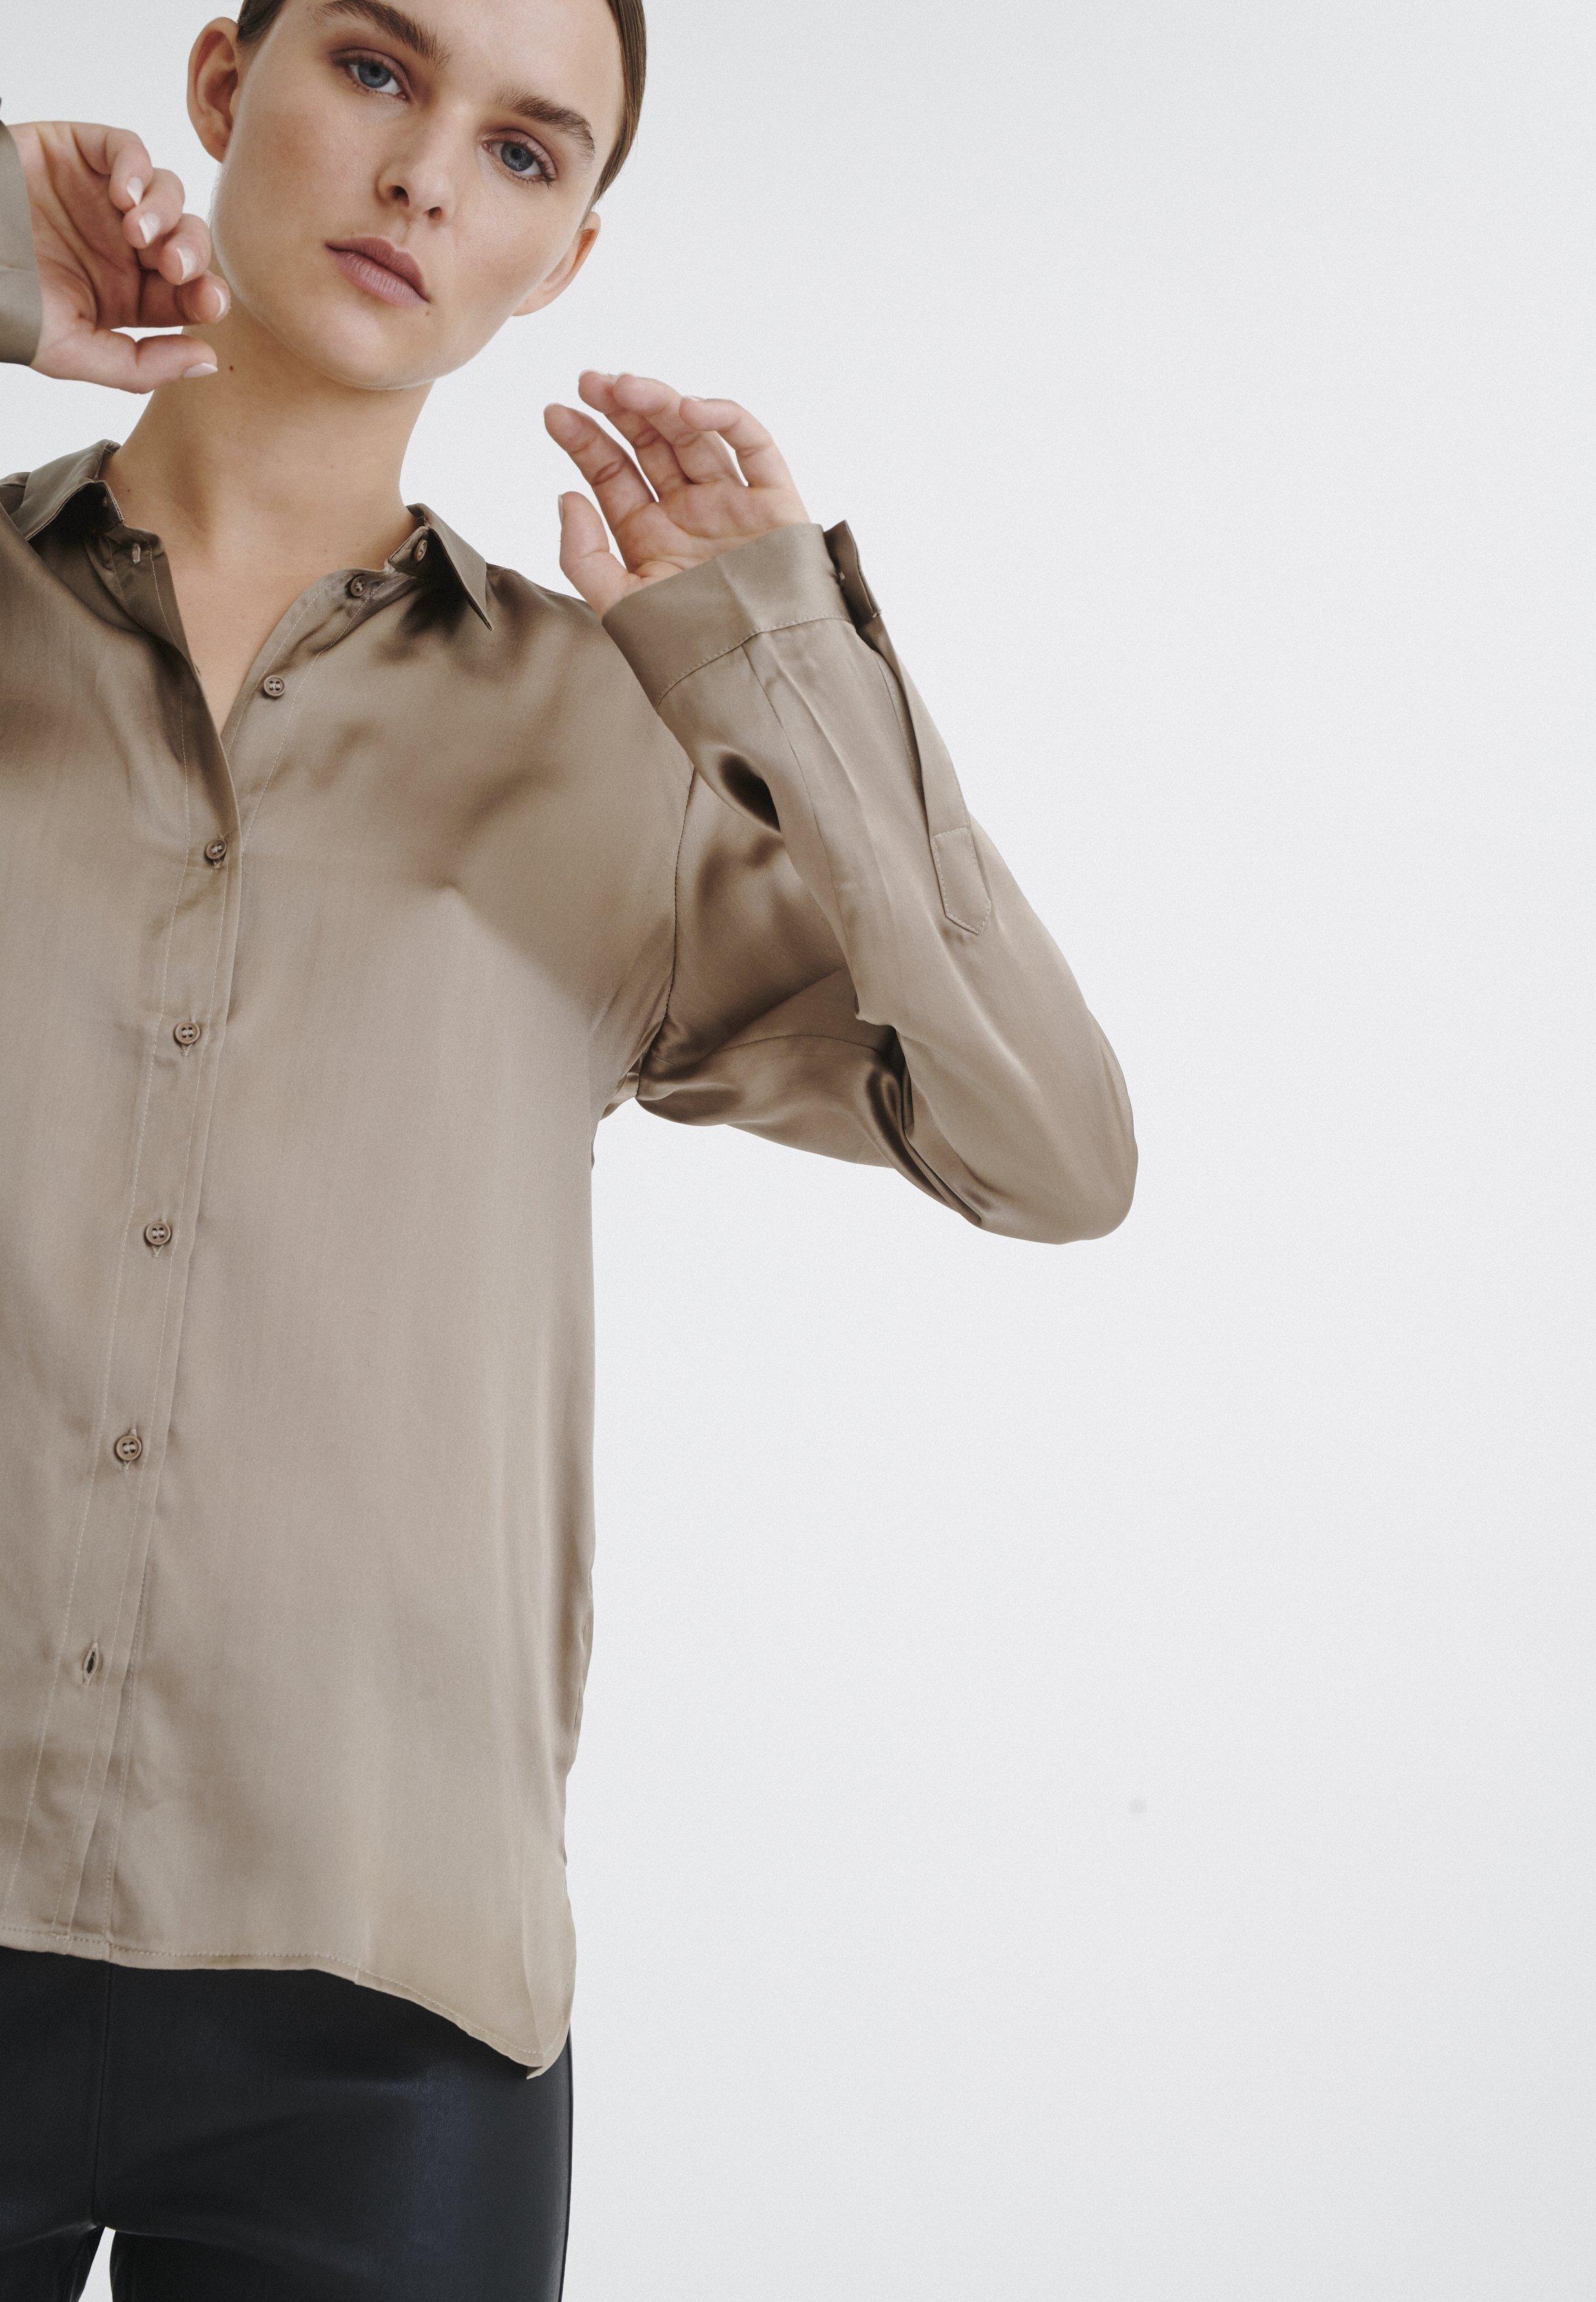 InWear LEONORE  - Chemisier - desert taupe - Chemisiers et tuniques femme xzO6W